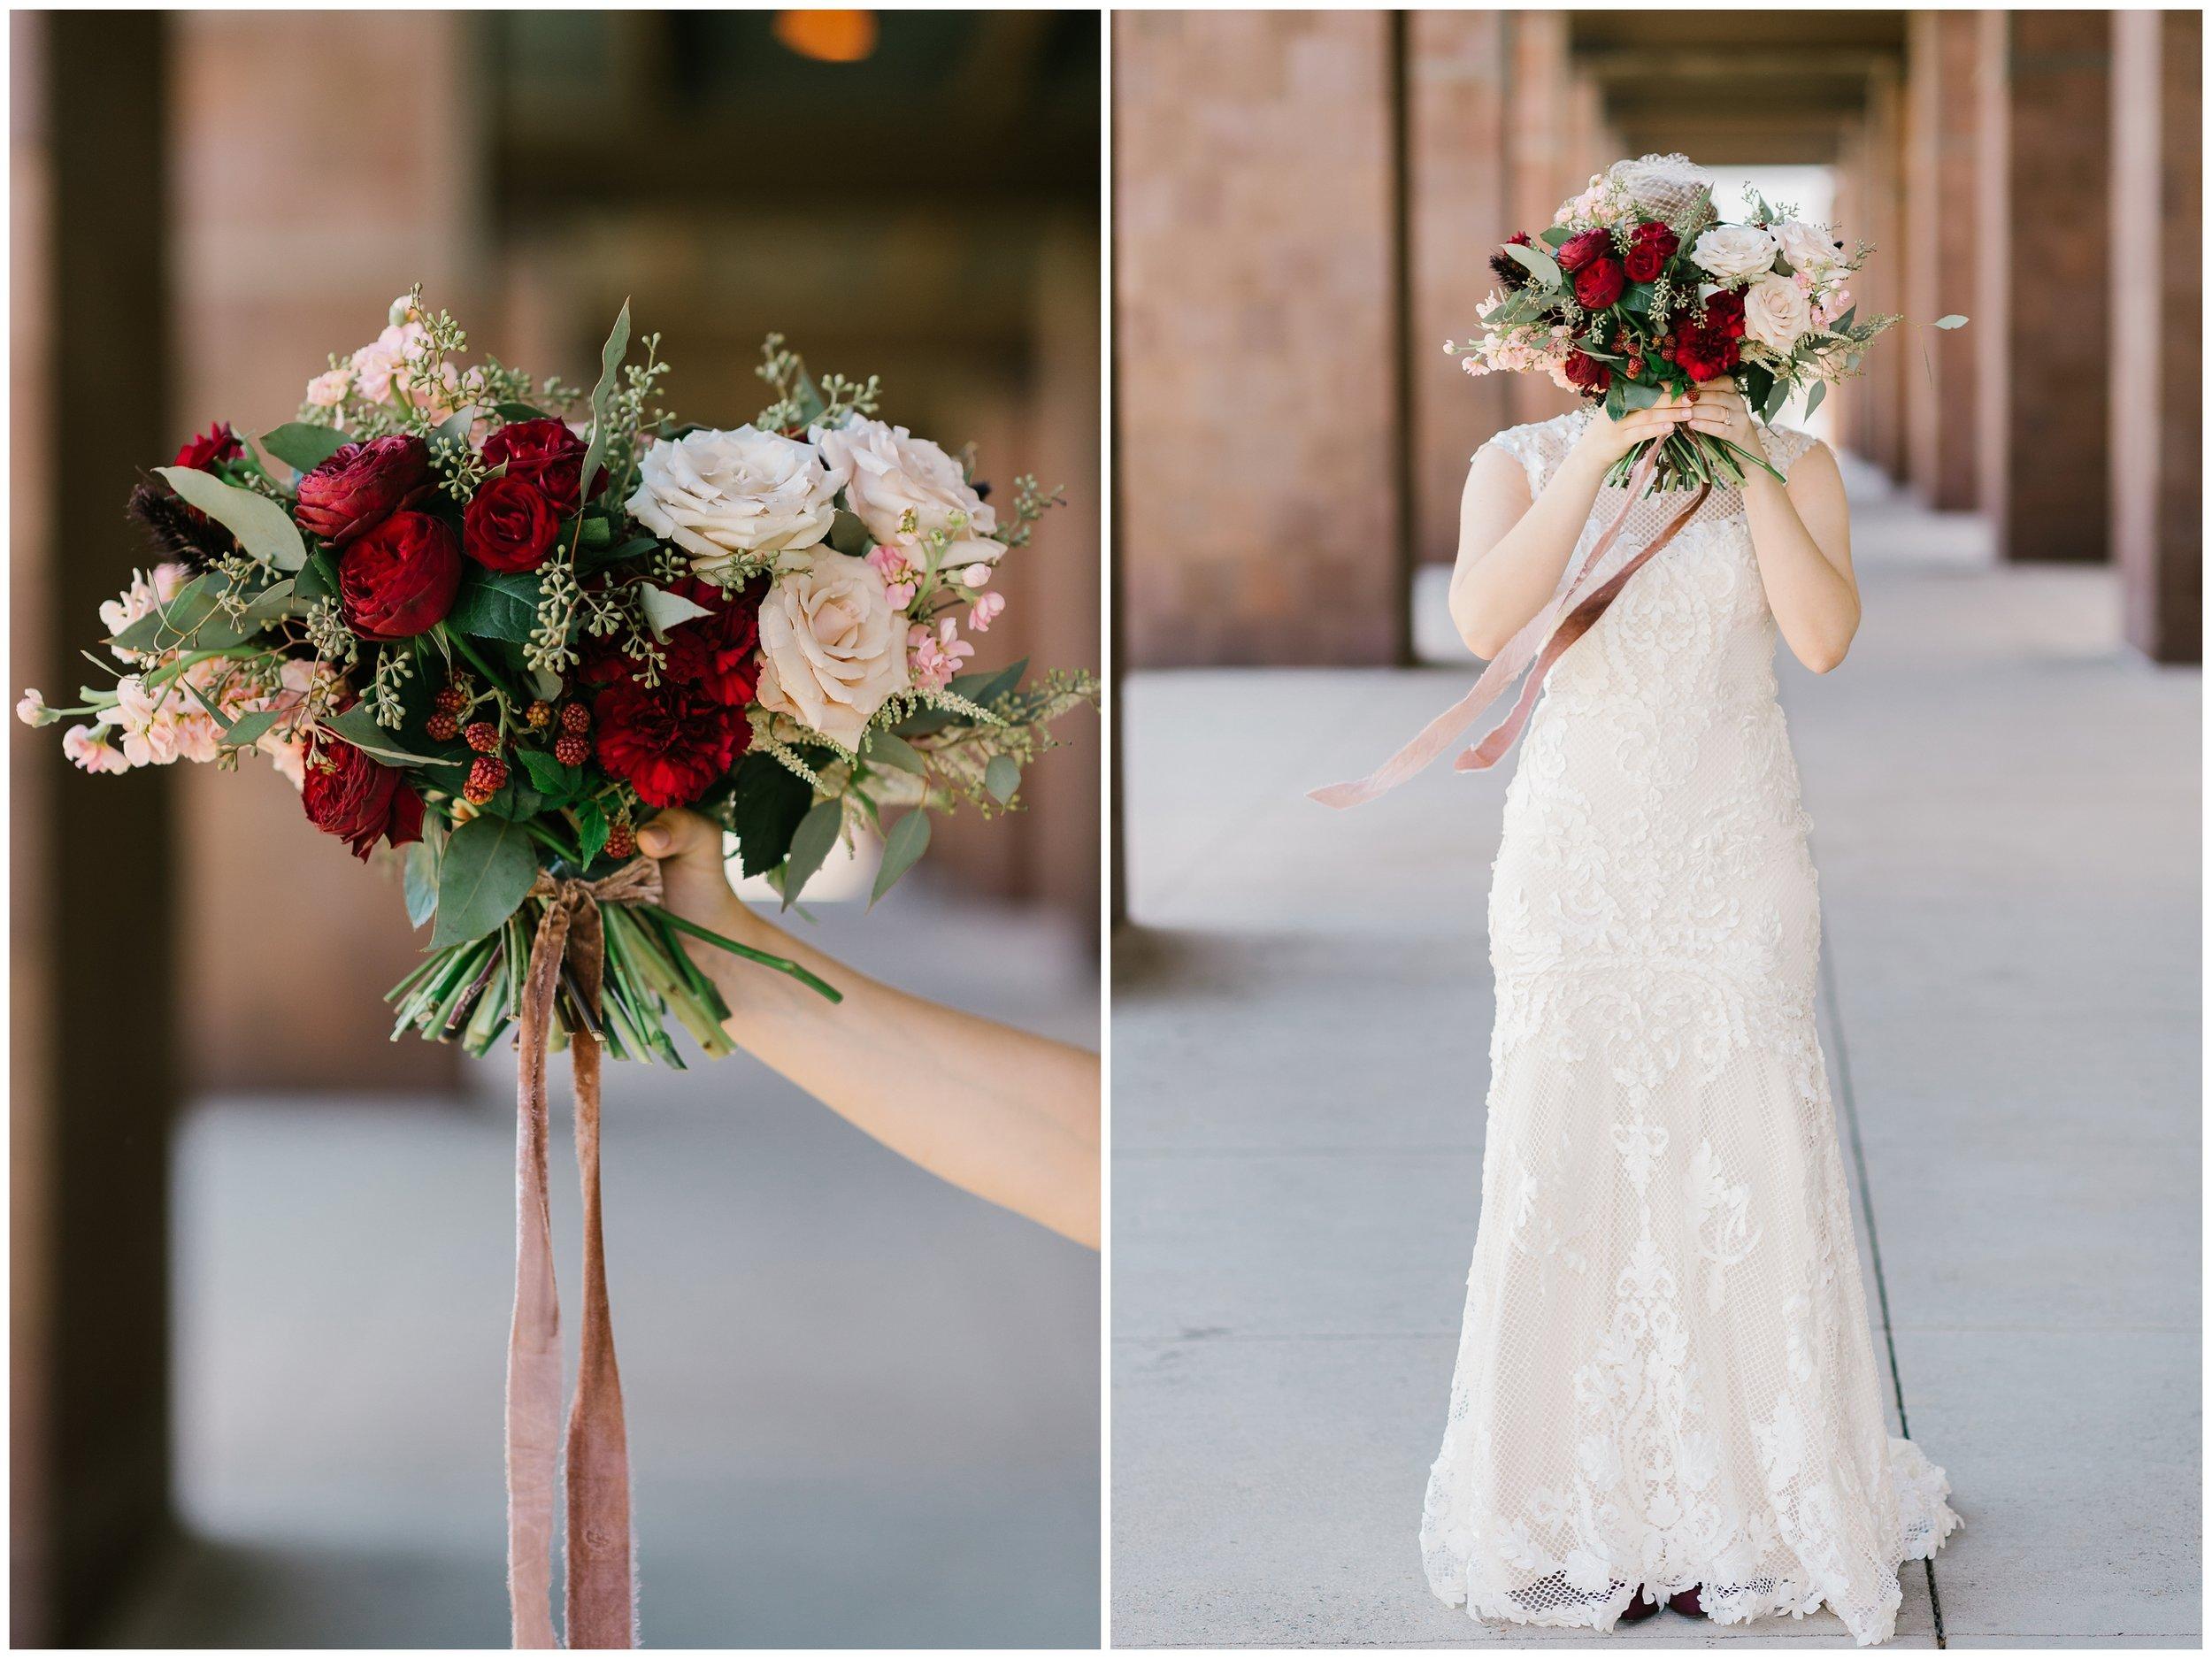 Rebecca_Shehorn_Photography_Indianapolis_Wedding_Photographer_7340.jpg